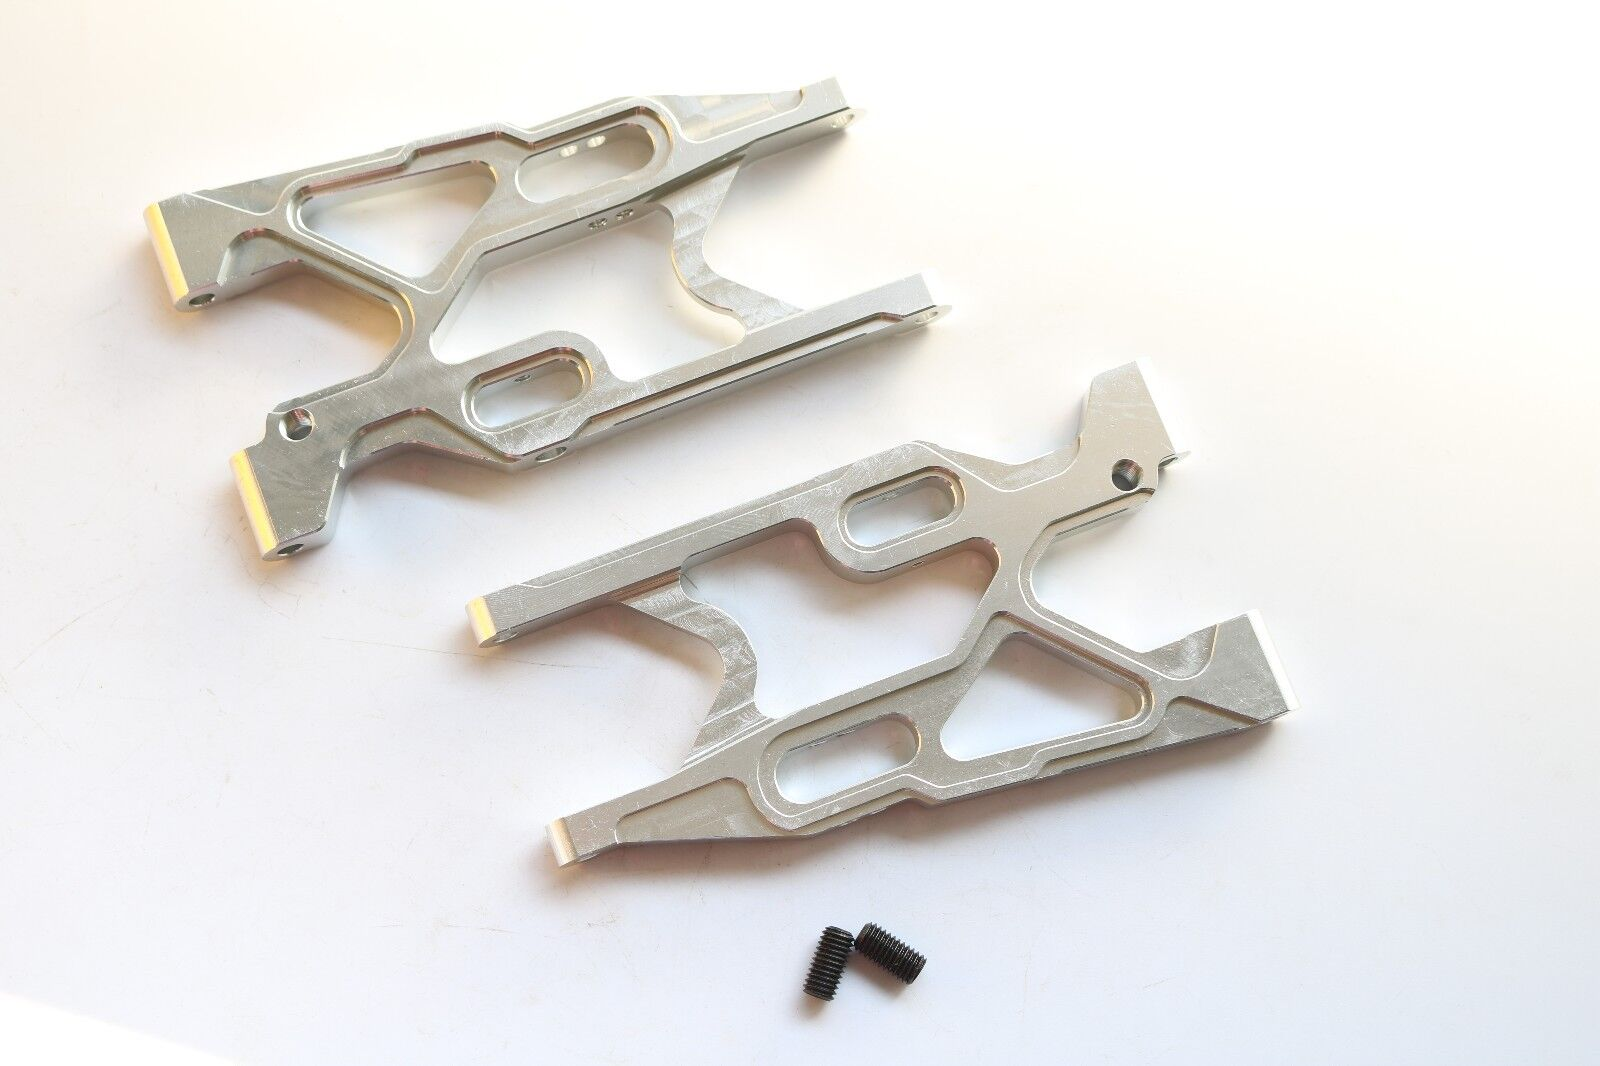 CNC tuttioy Rear Suspension Arm set  for Losi 5ive T Rovan LT re Motor Sliver  risparmia il 35% - 70% di sconto